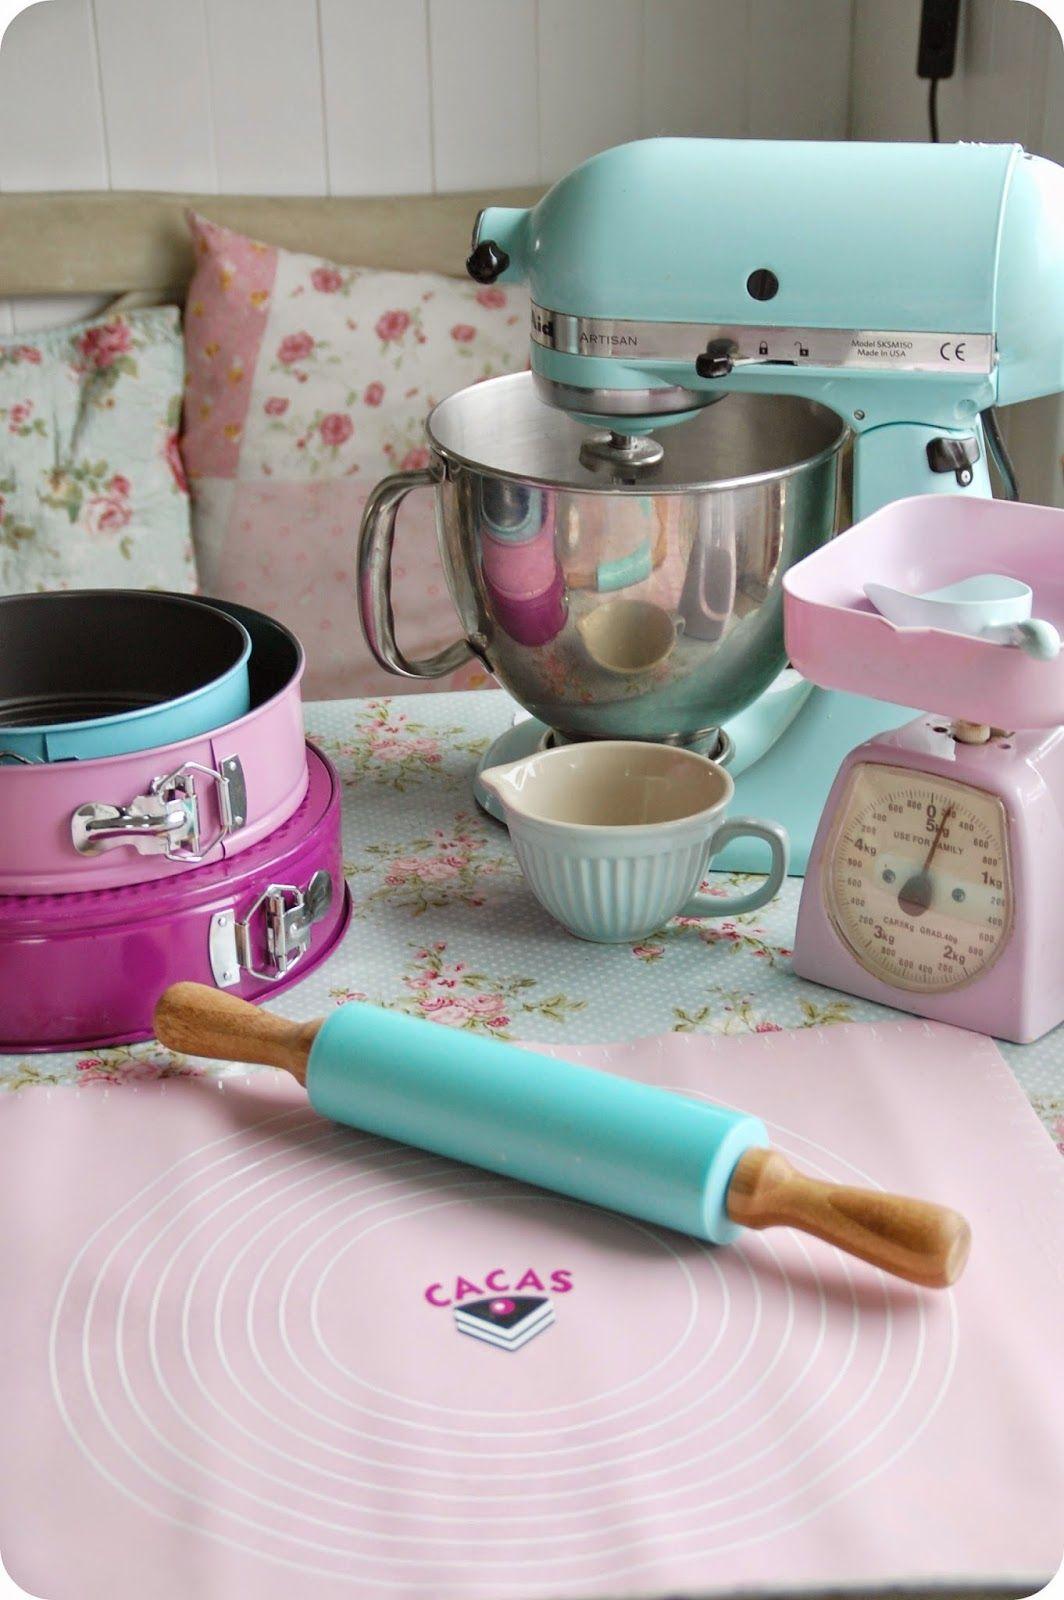 Colorful Kitchen Supplies: Utensilios Para Hornear, Utensilios